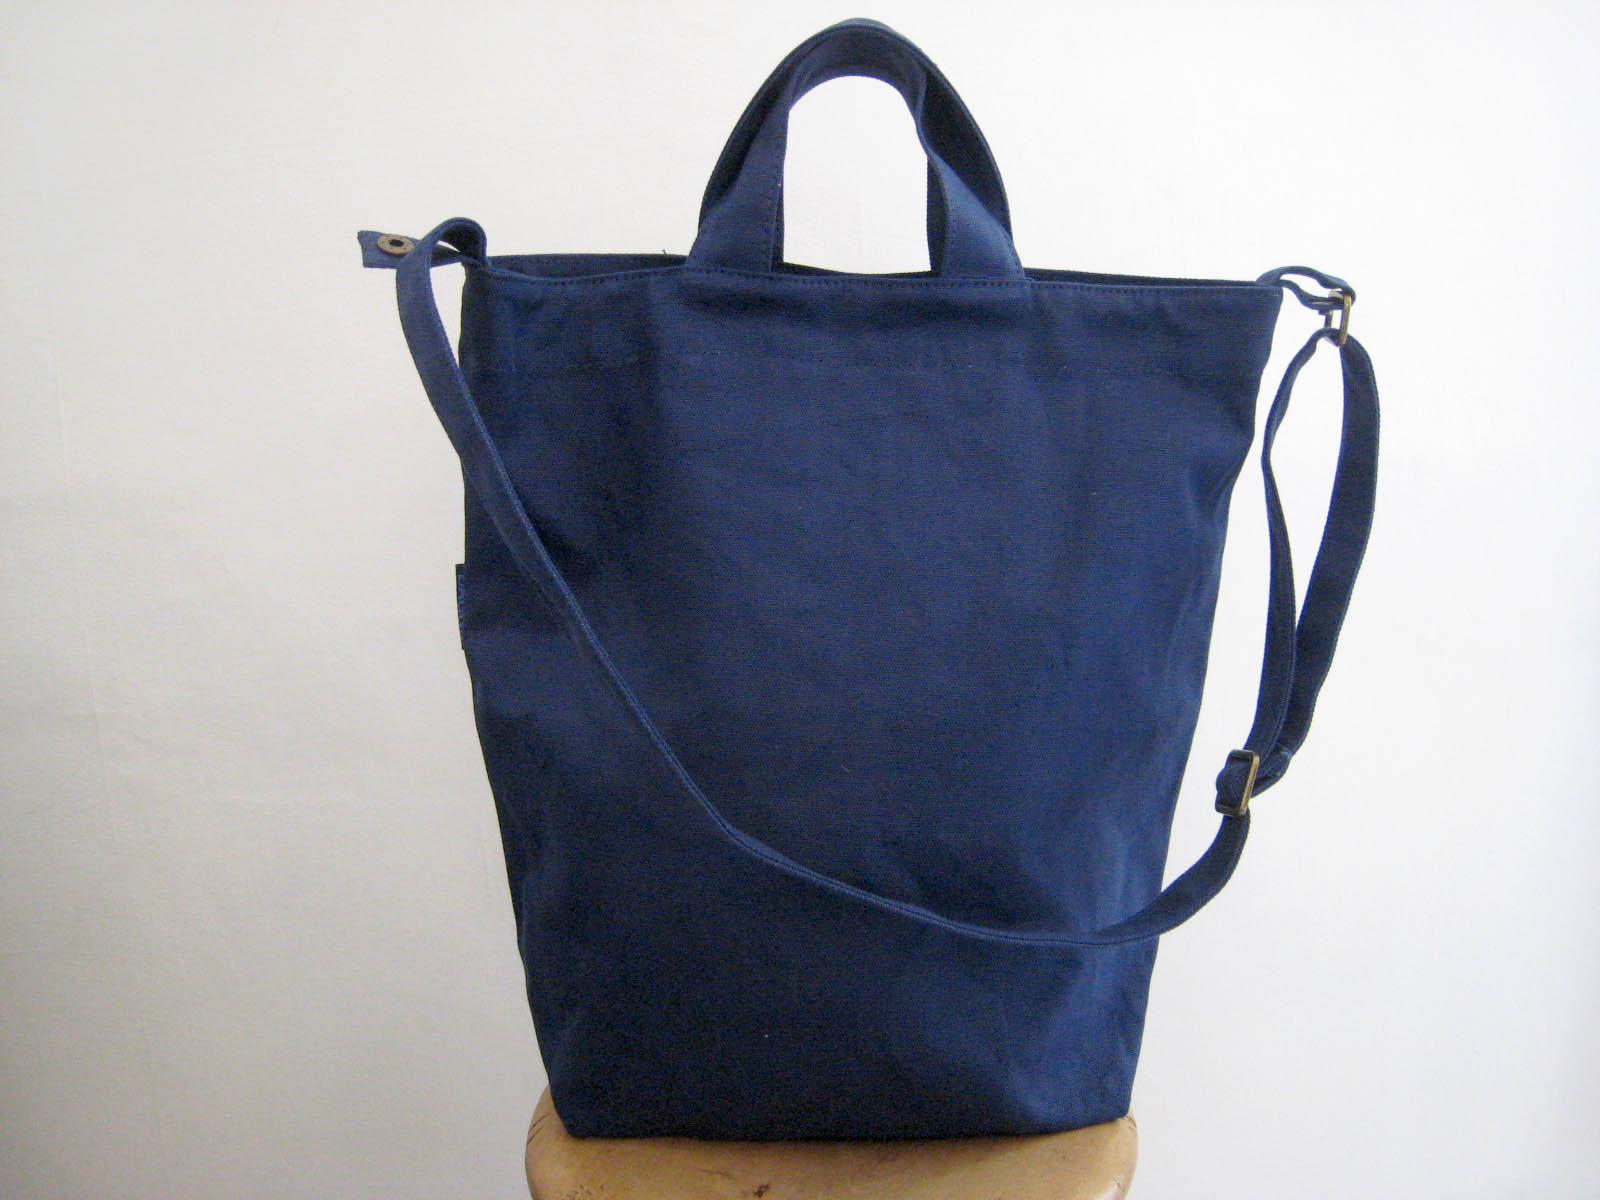 baggu blue duck bag found bath designer boutique stella telegraph top 50